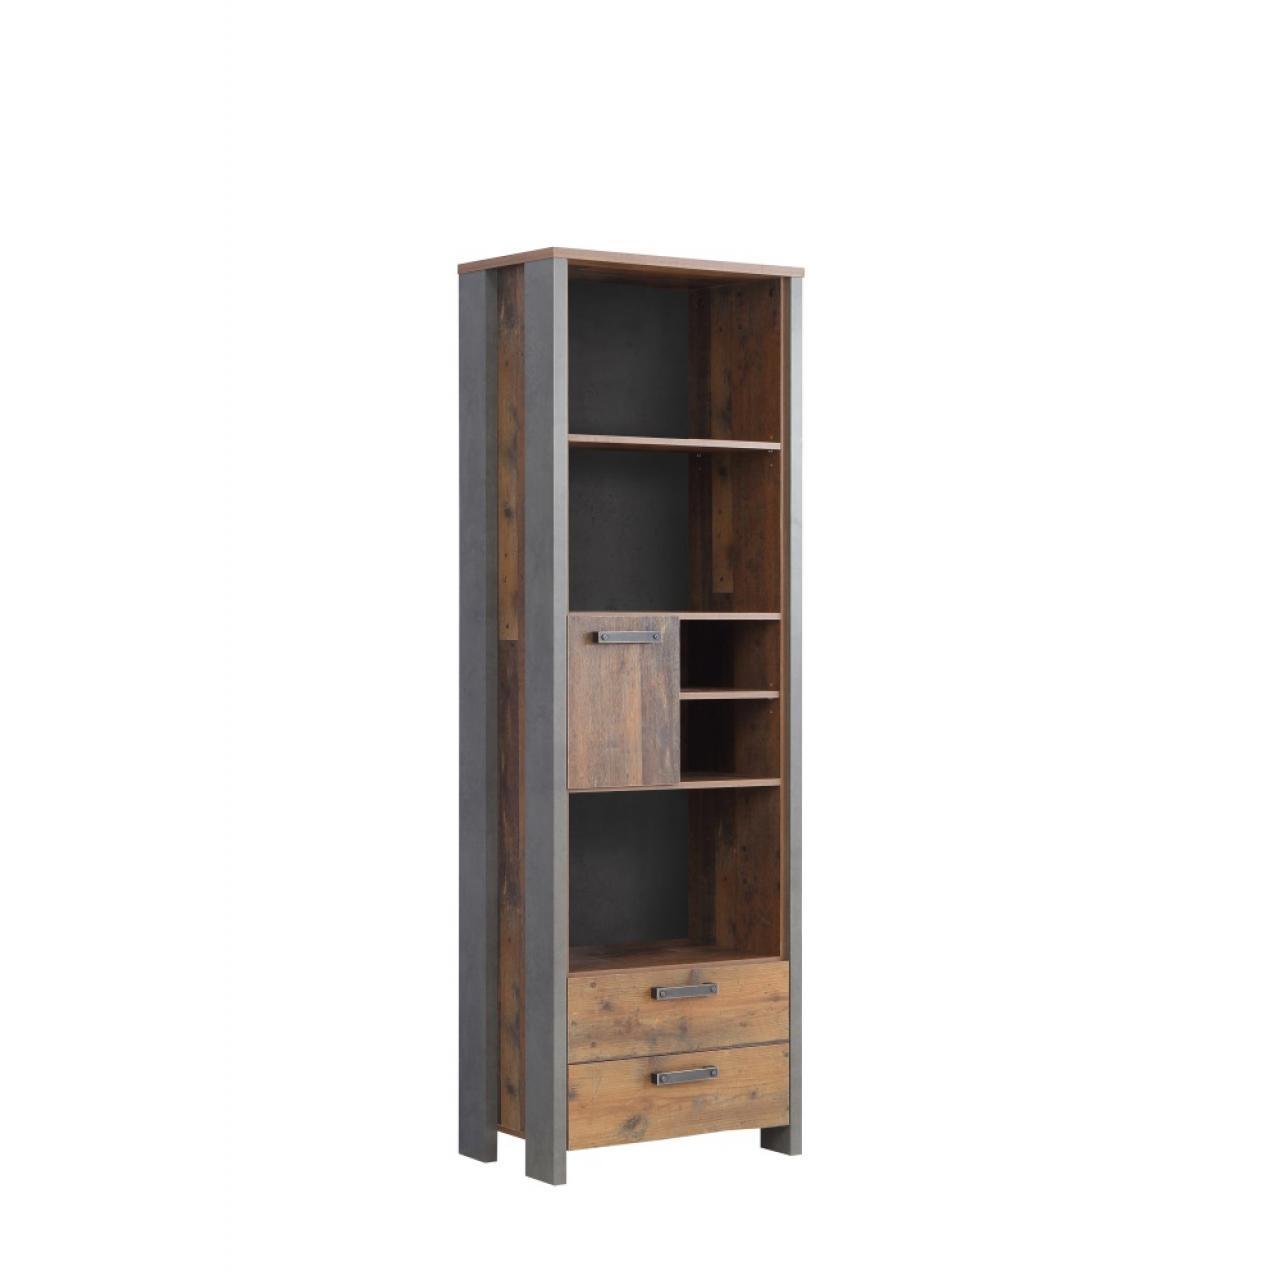 Regal Clif Highboardvitrine Old Wood Vintage Nb. Betonoptik Dunkelgrau MDF